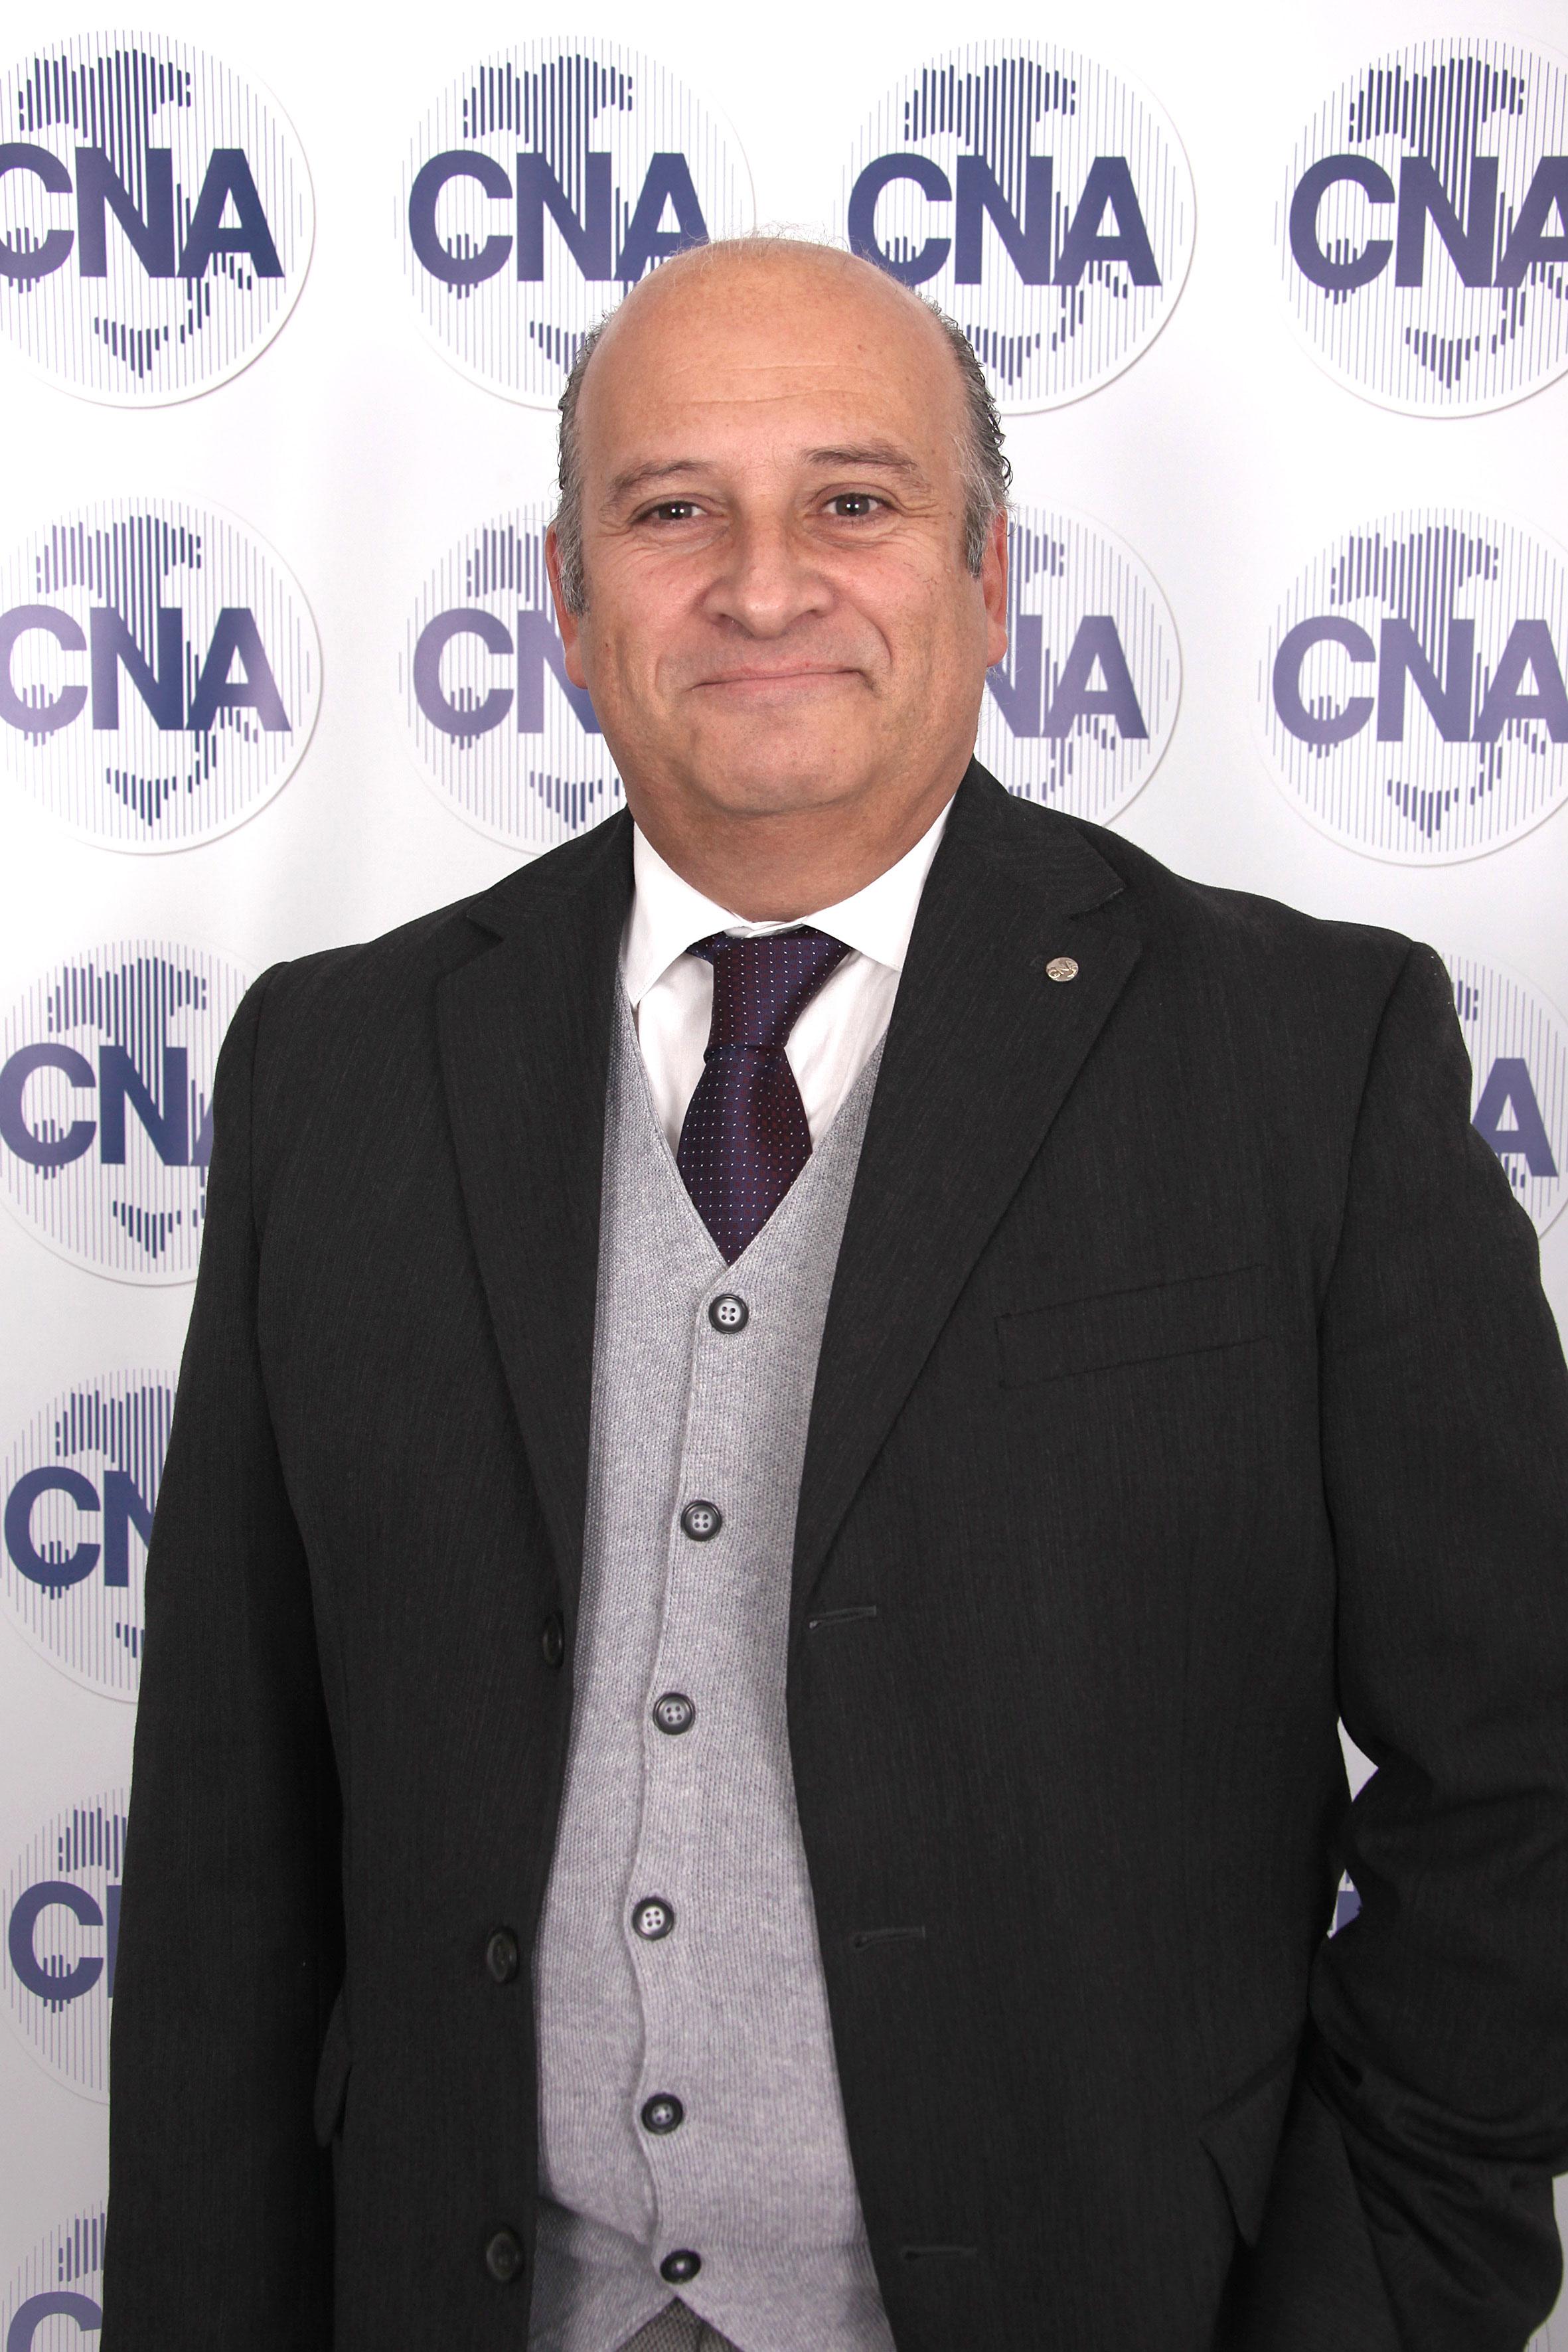 Sabatini Gino - Vice Presidente